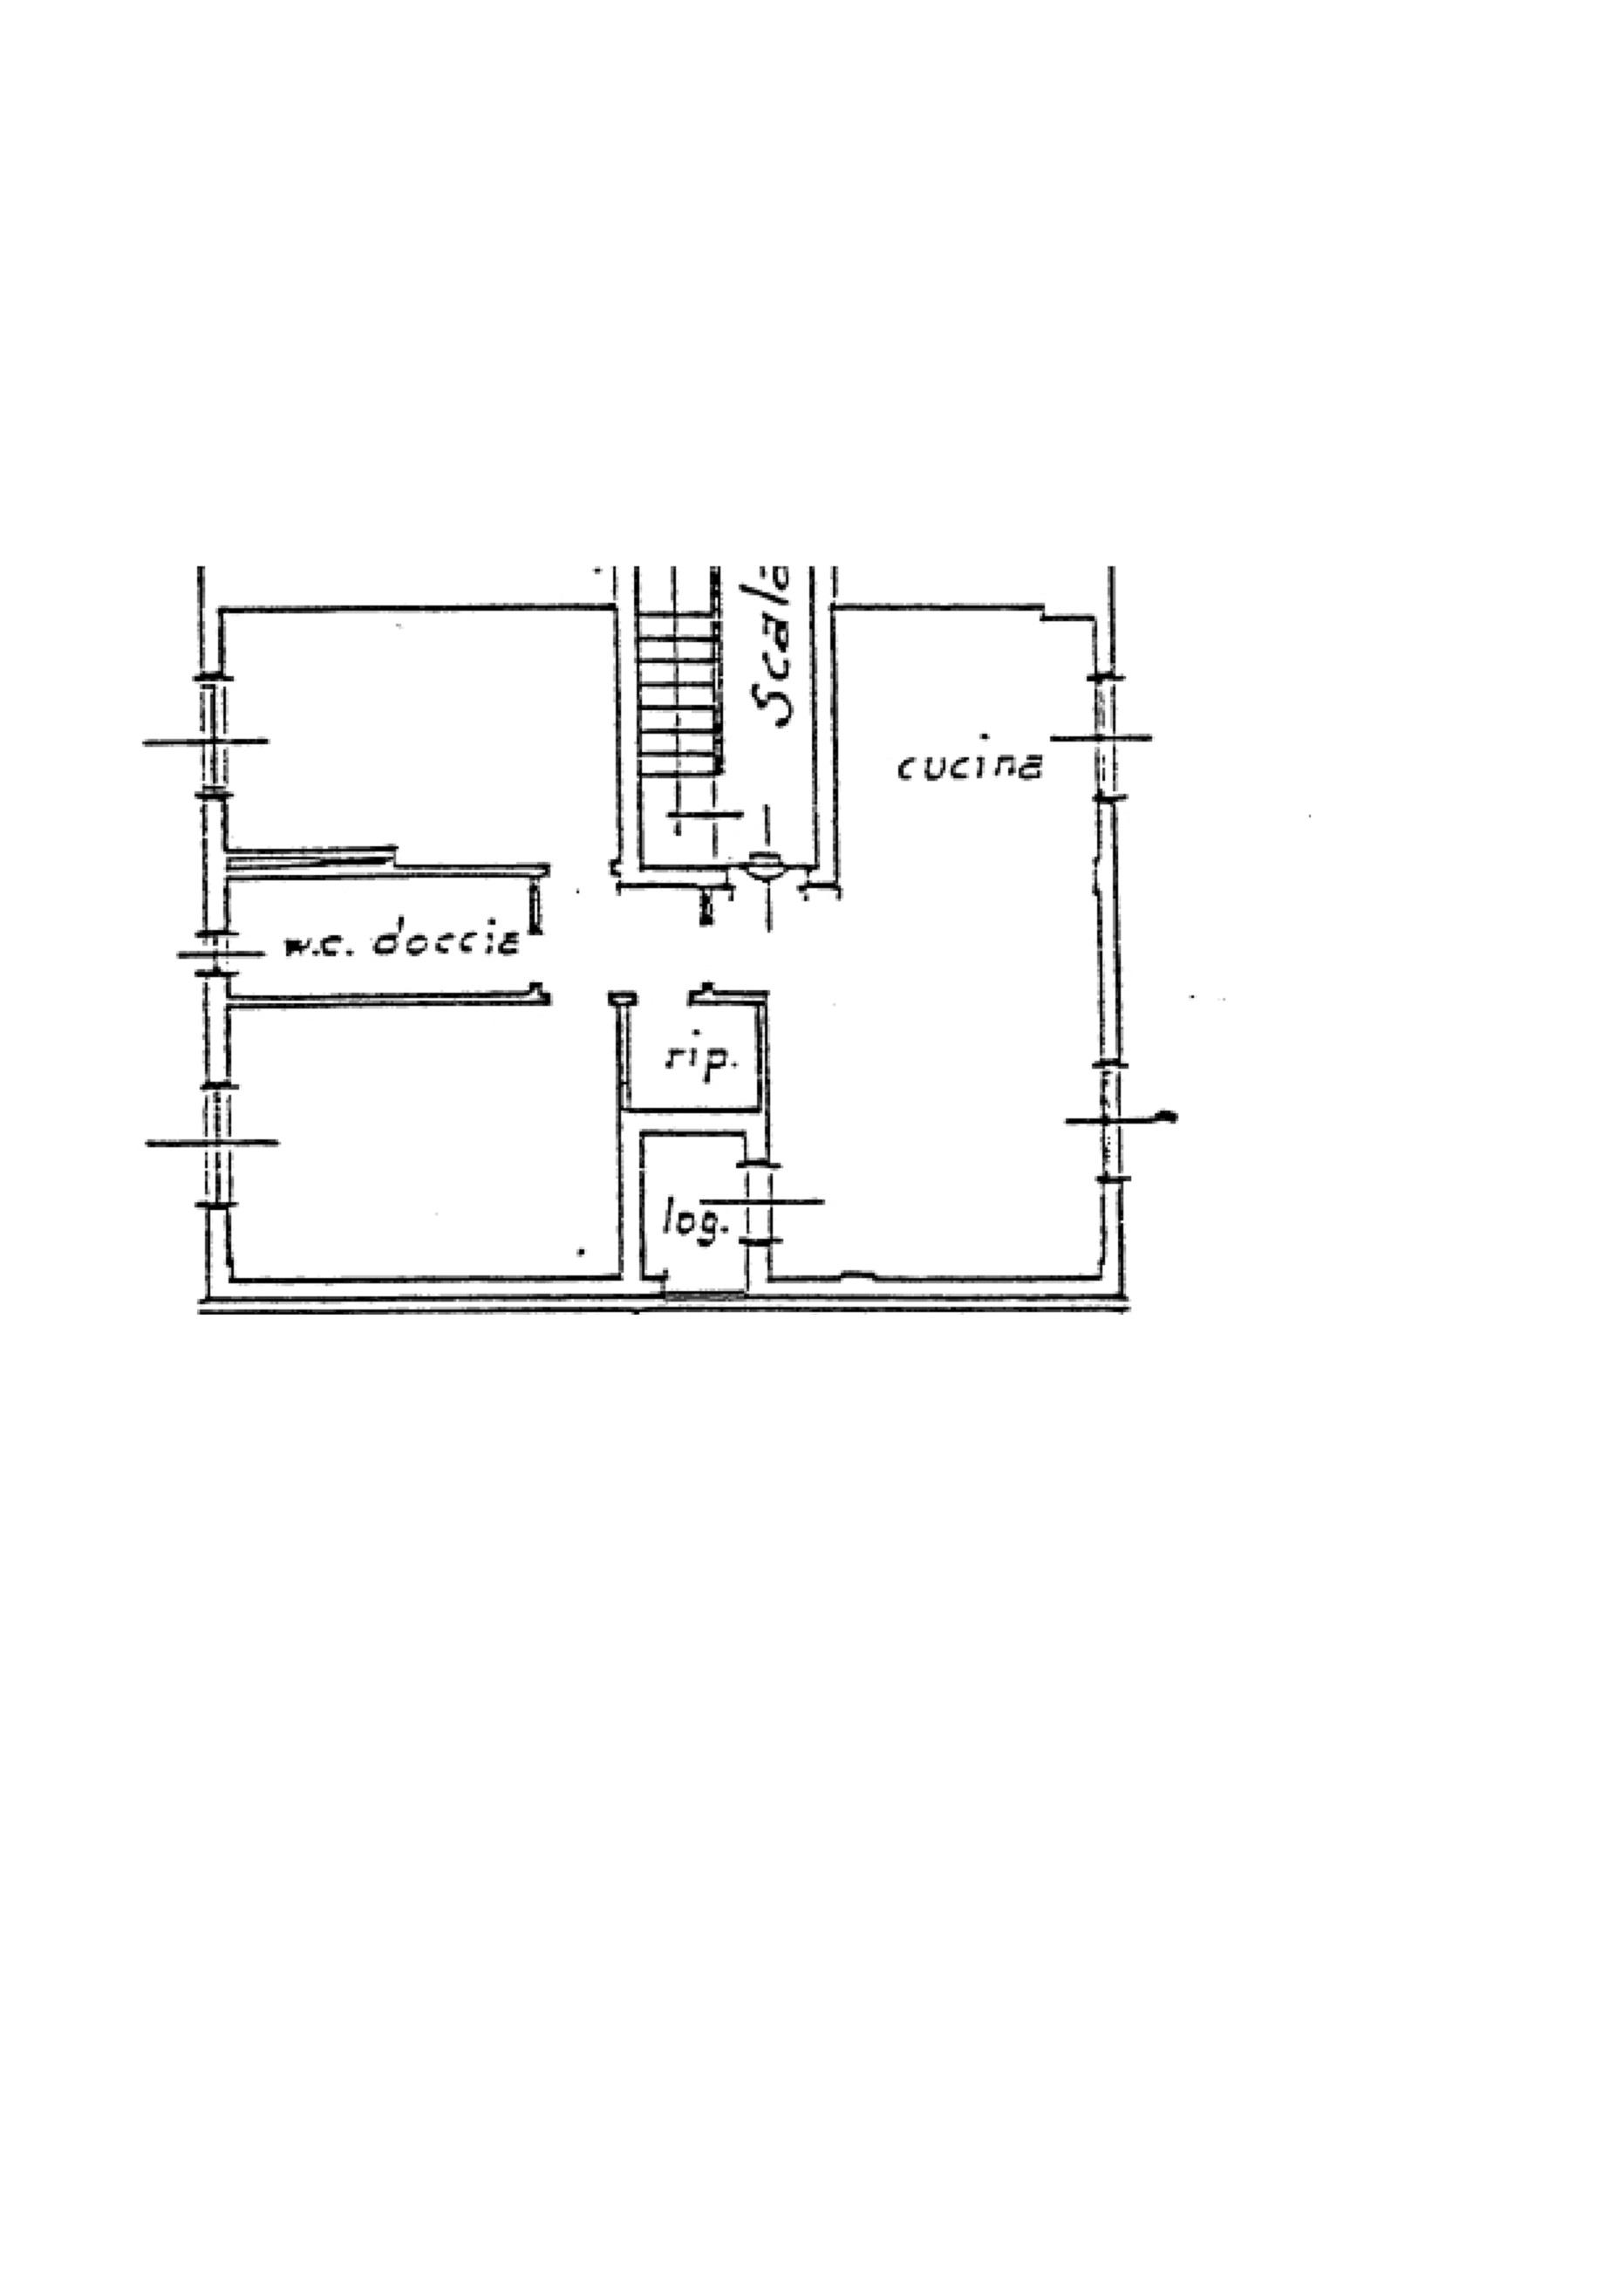 Appartamento in vendita, rif. K112 (Planimetria 1/1)